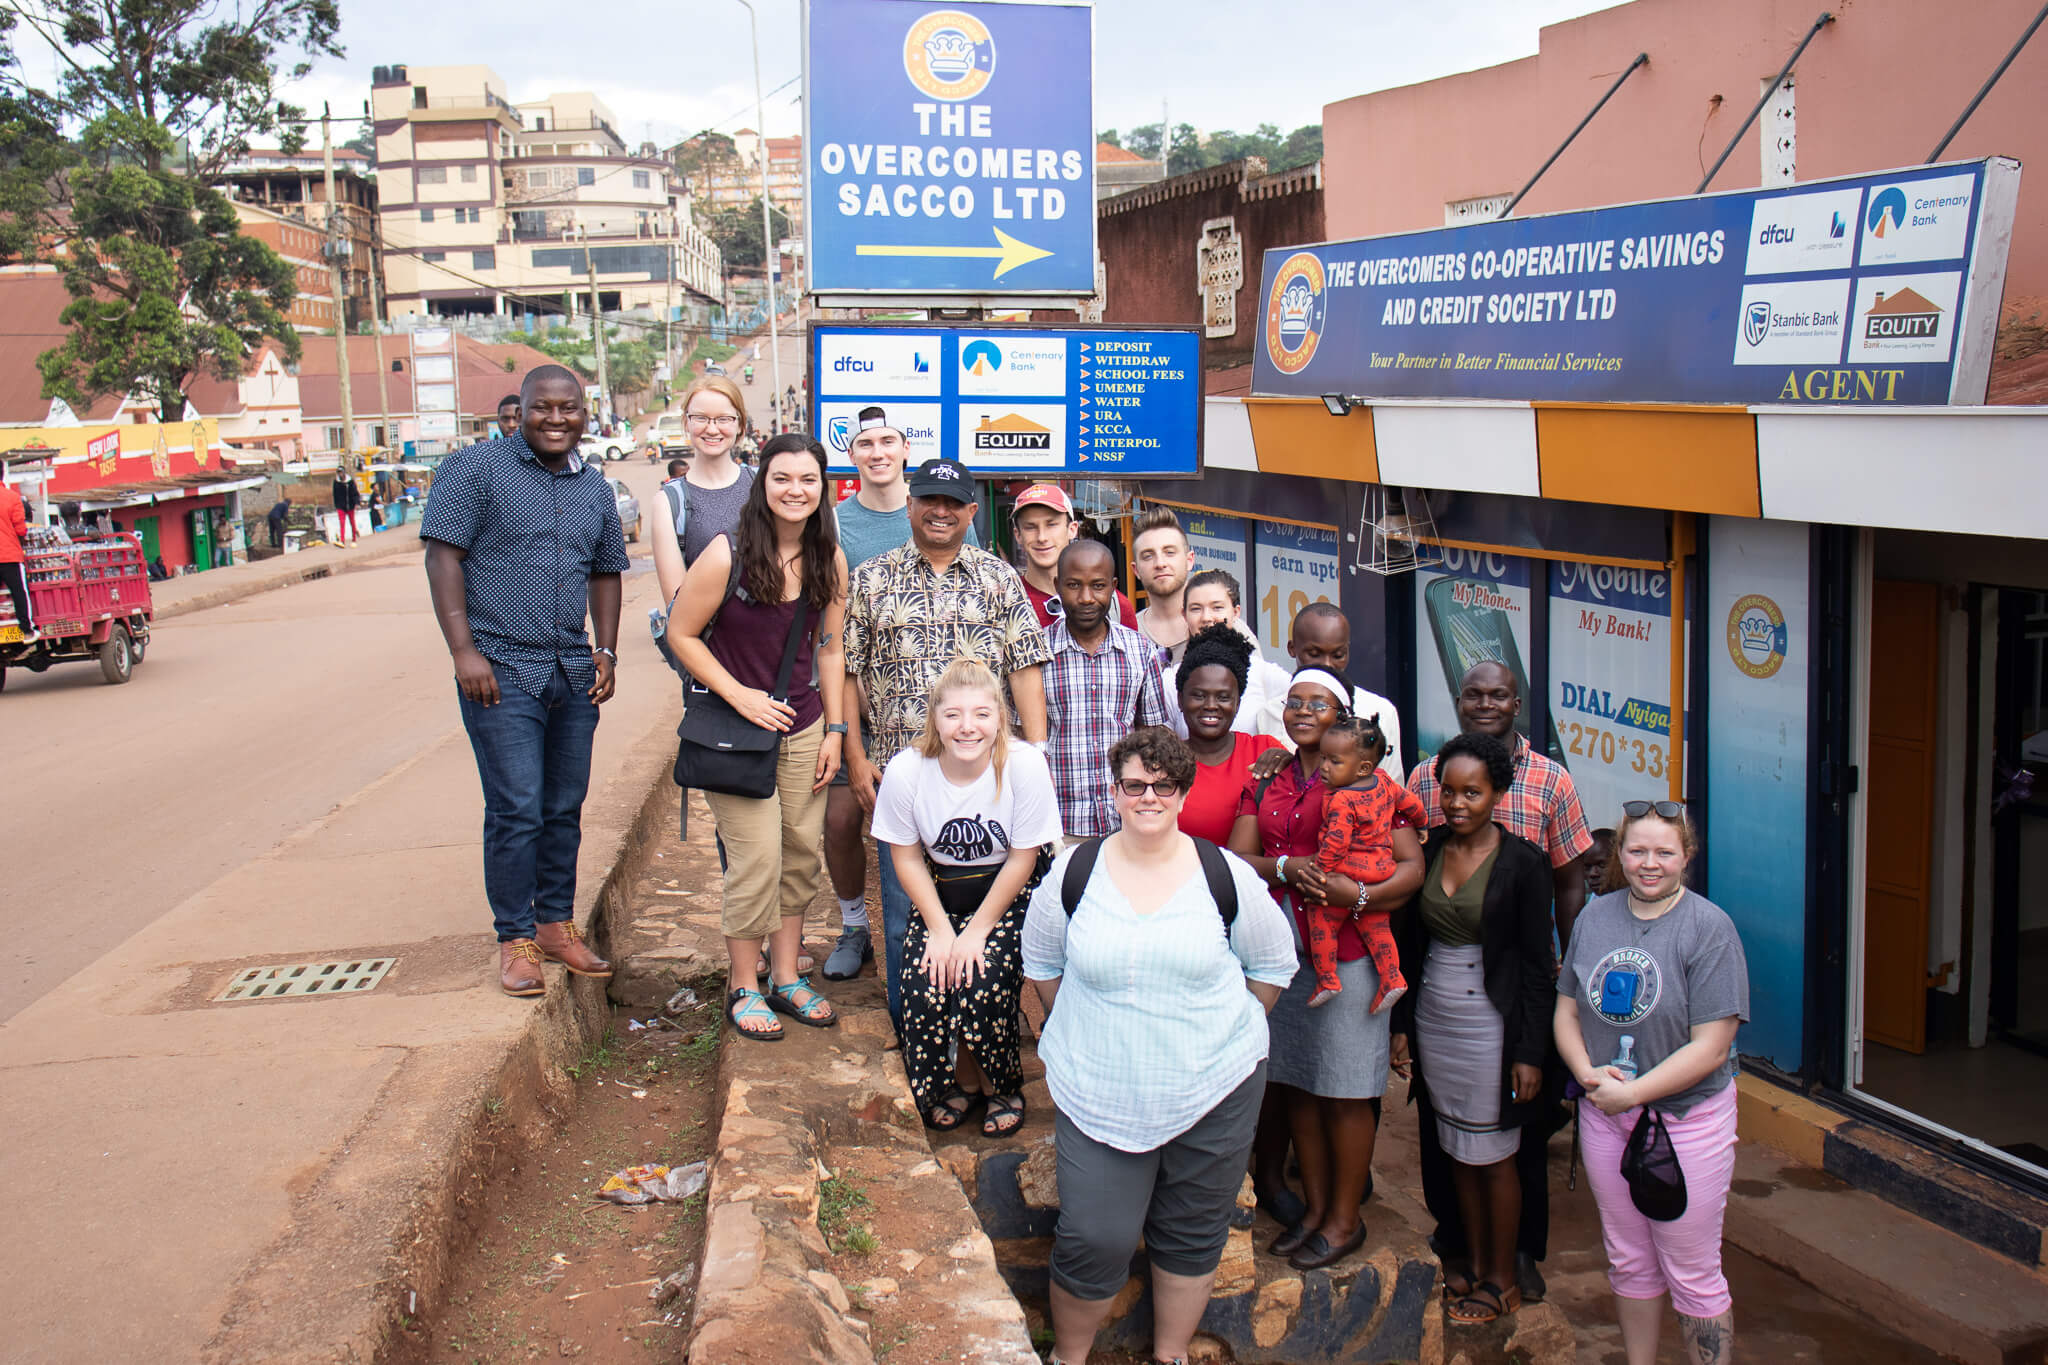 Day 2: [KAMPALA, UGANDA] CULTURAL INTRODUCTION | INNOVATION VILLAGE | MICROFINANCE